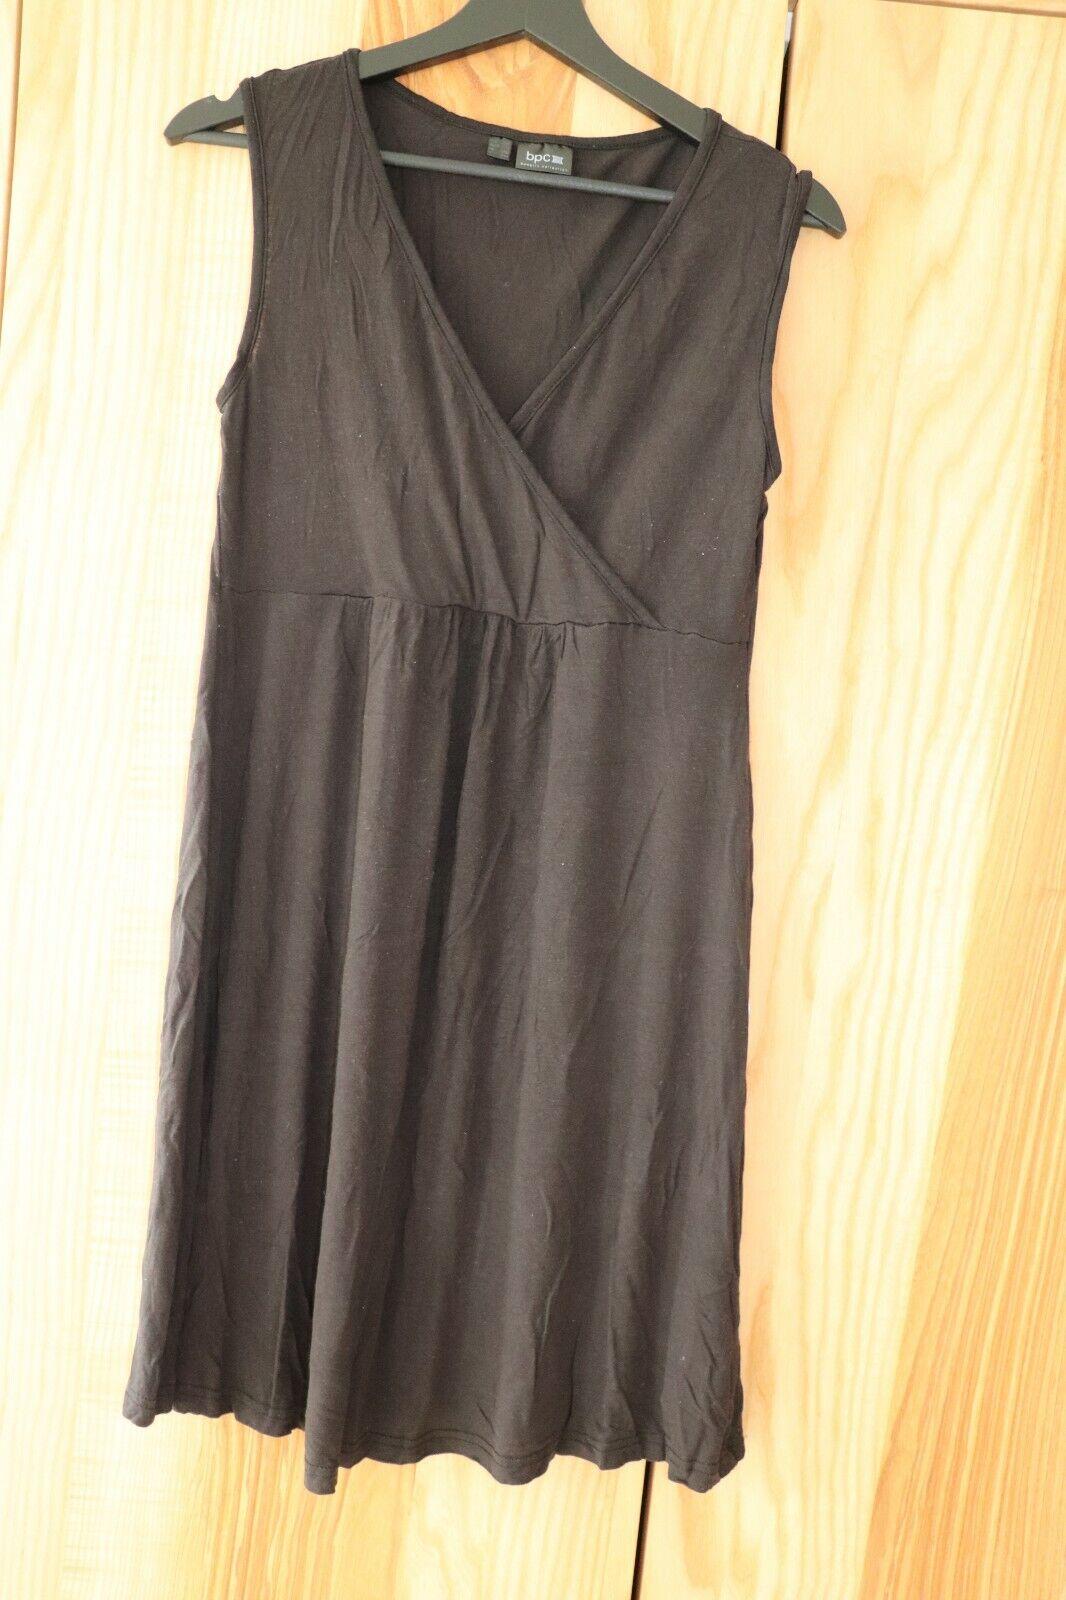 Umstandskleidung, Umstands-Nachthemd, Pyjama, schwarz, Gr. 36/38, bpc, ärmellos